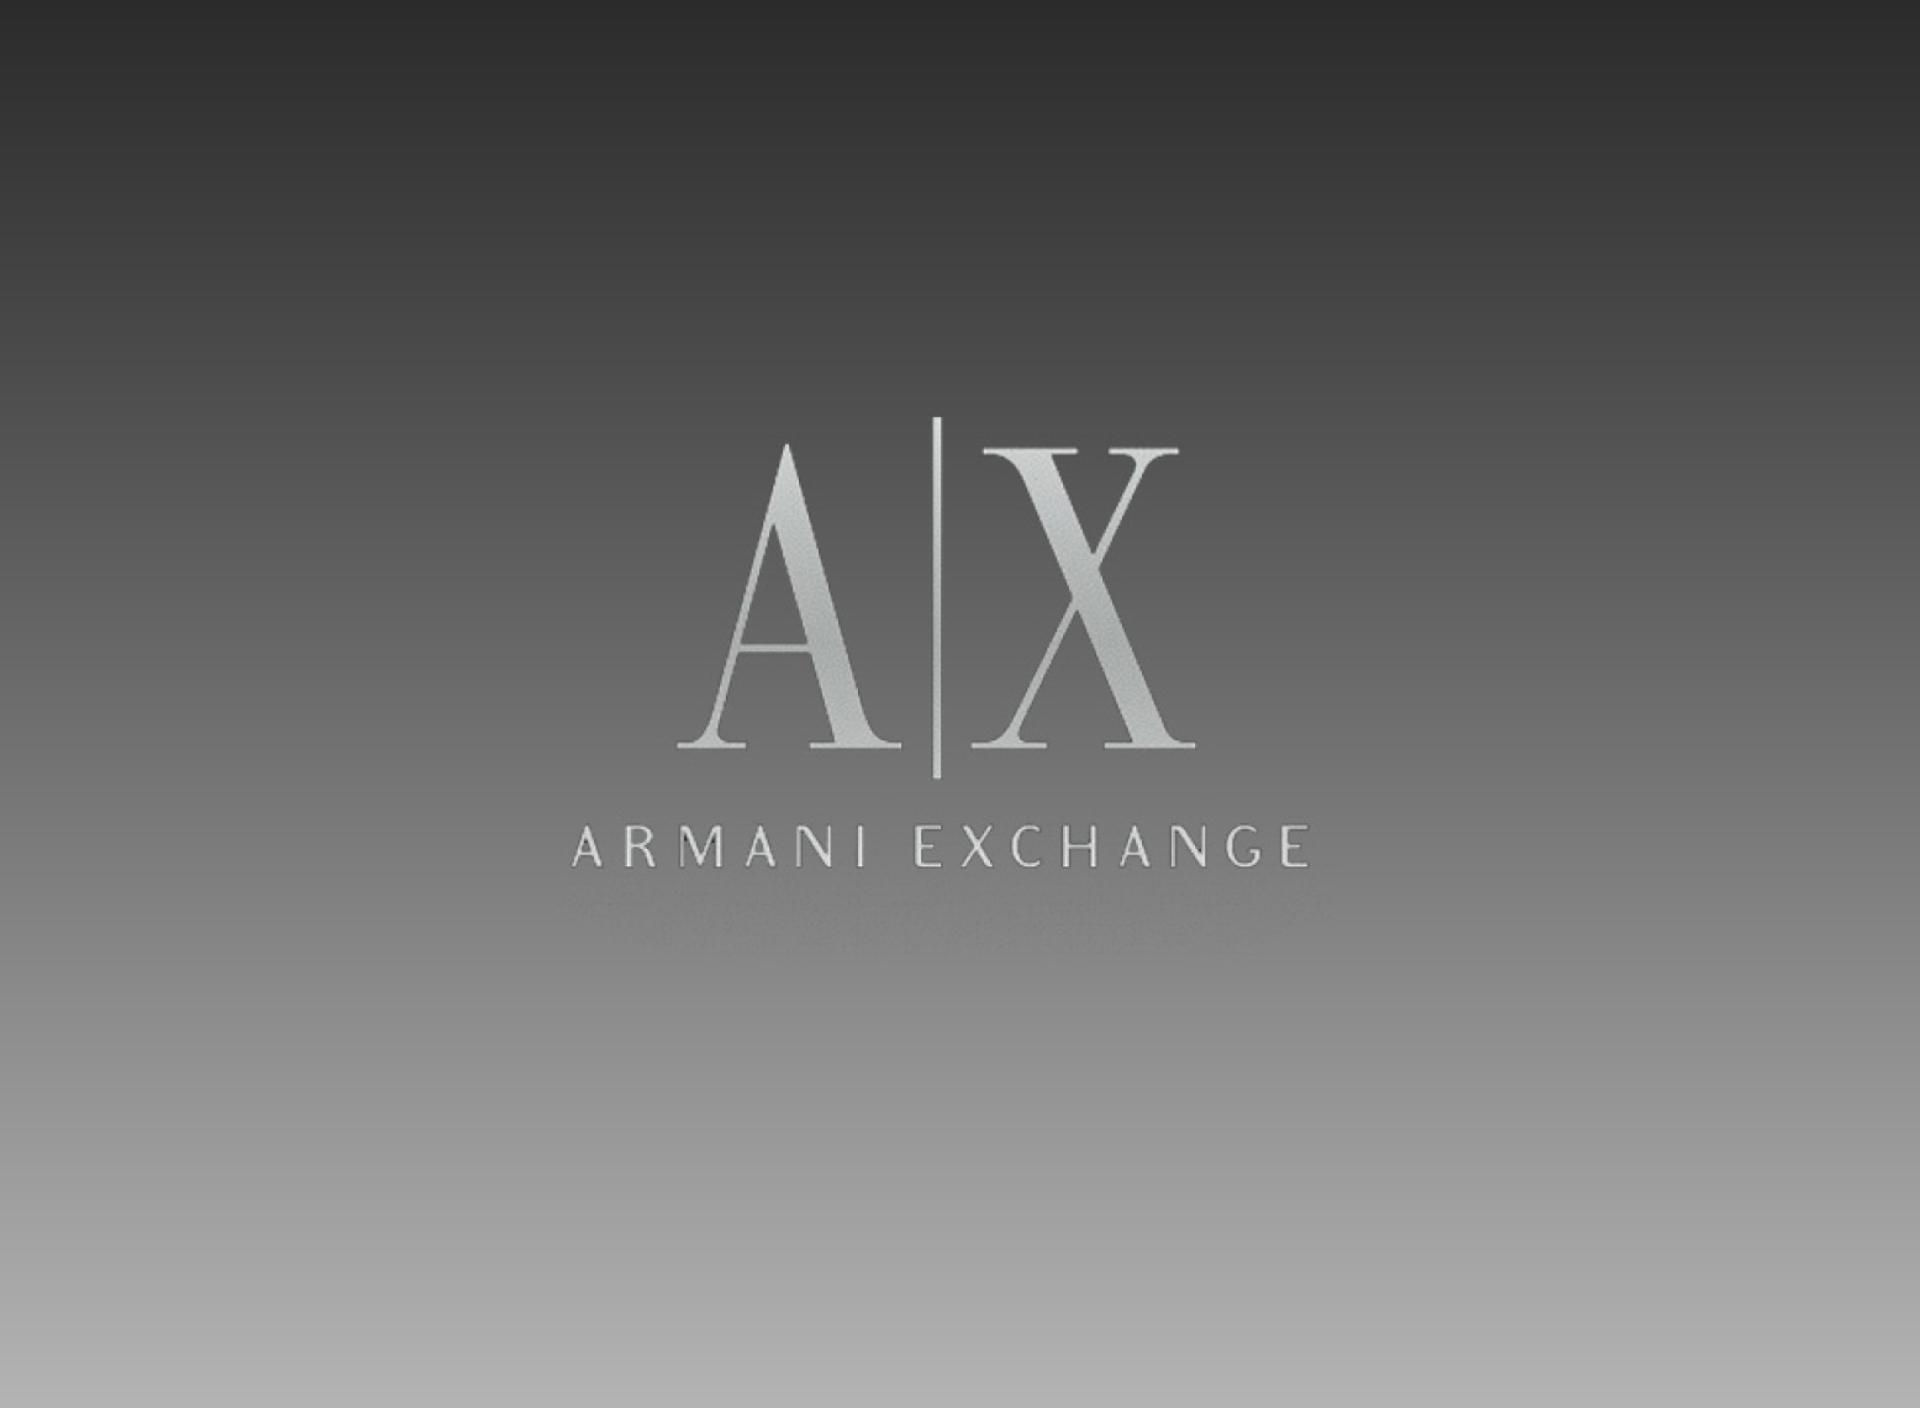 Armani Casa Wallpaper Armani Exchange Wallpaper For 1920x1408